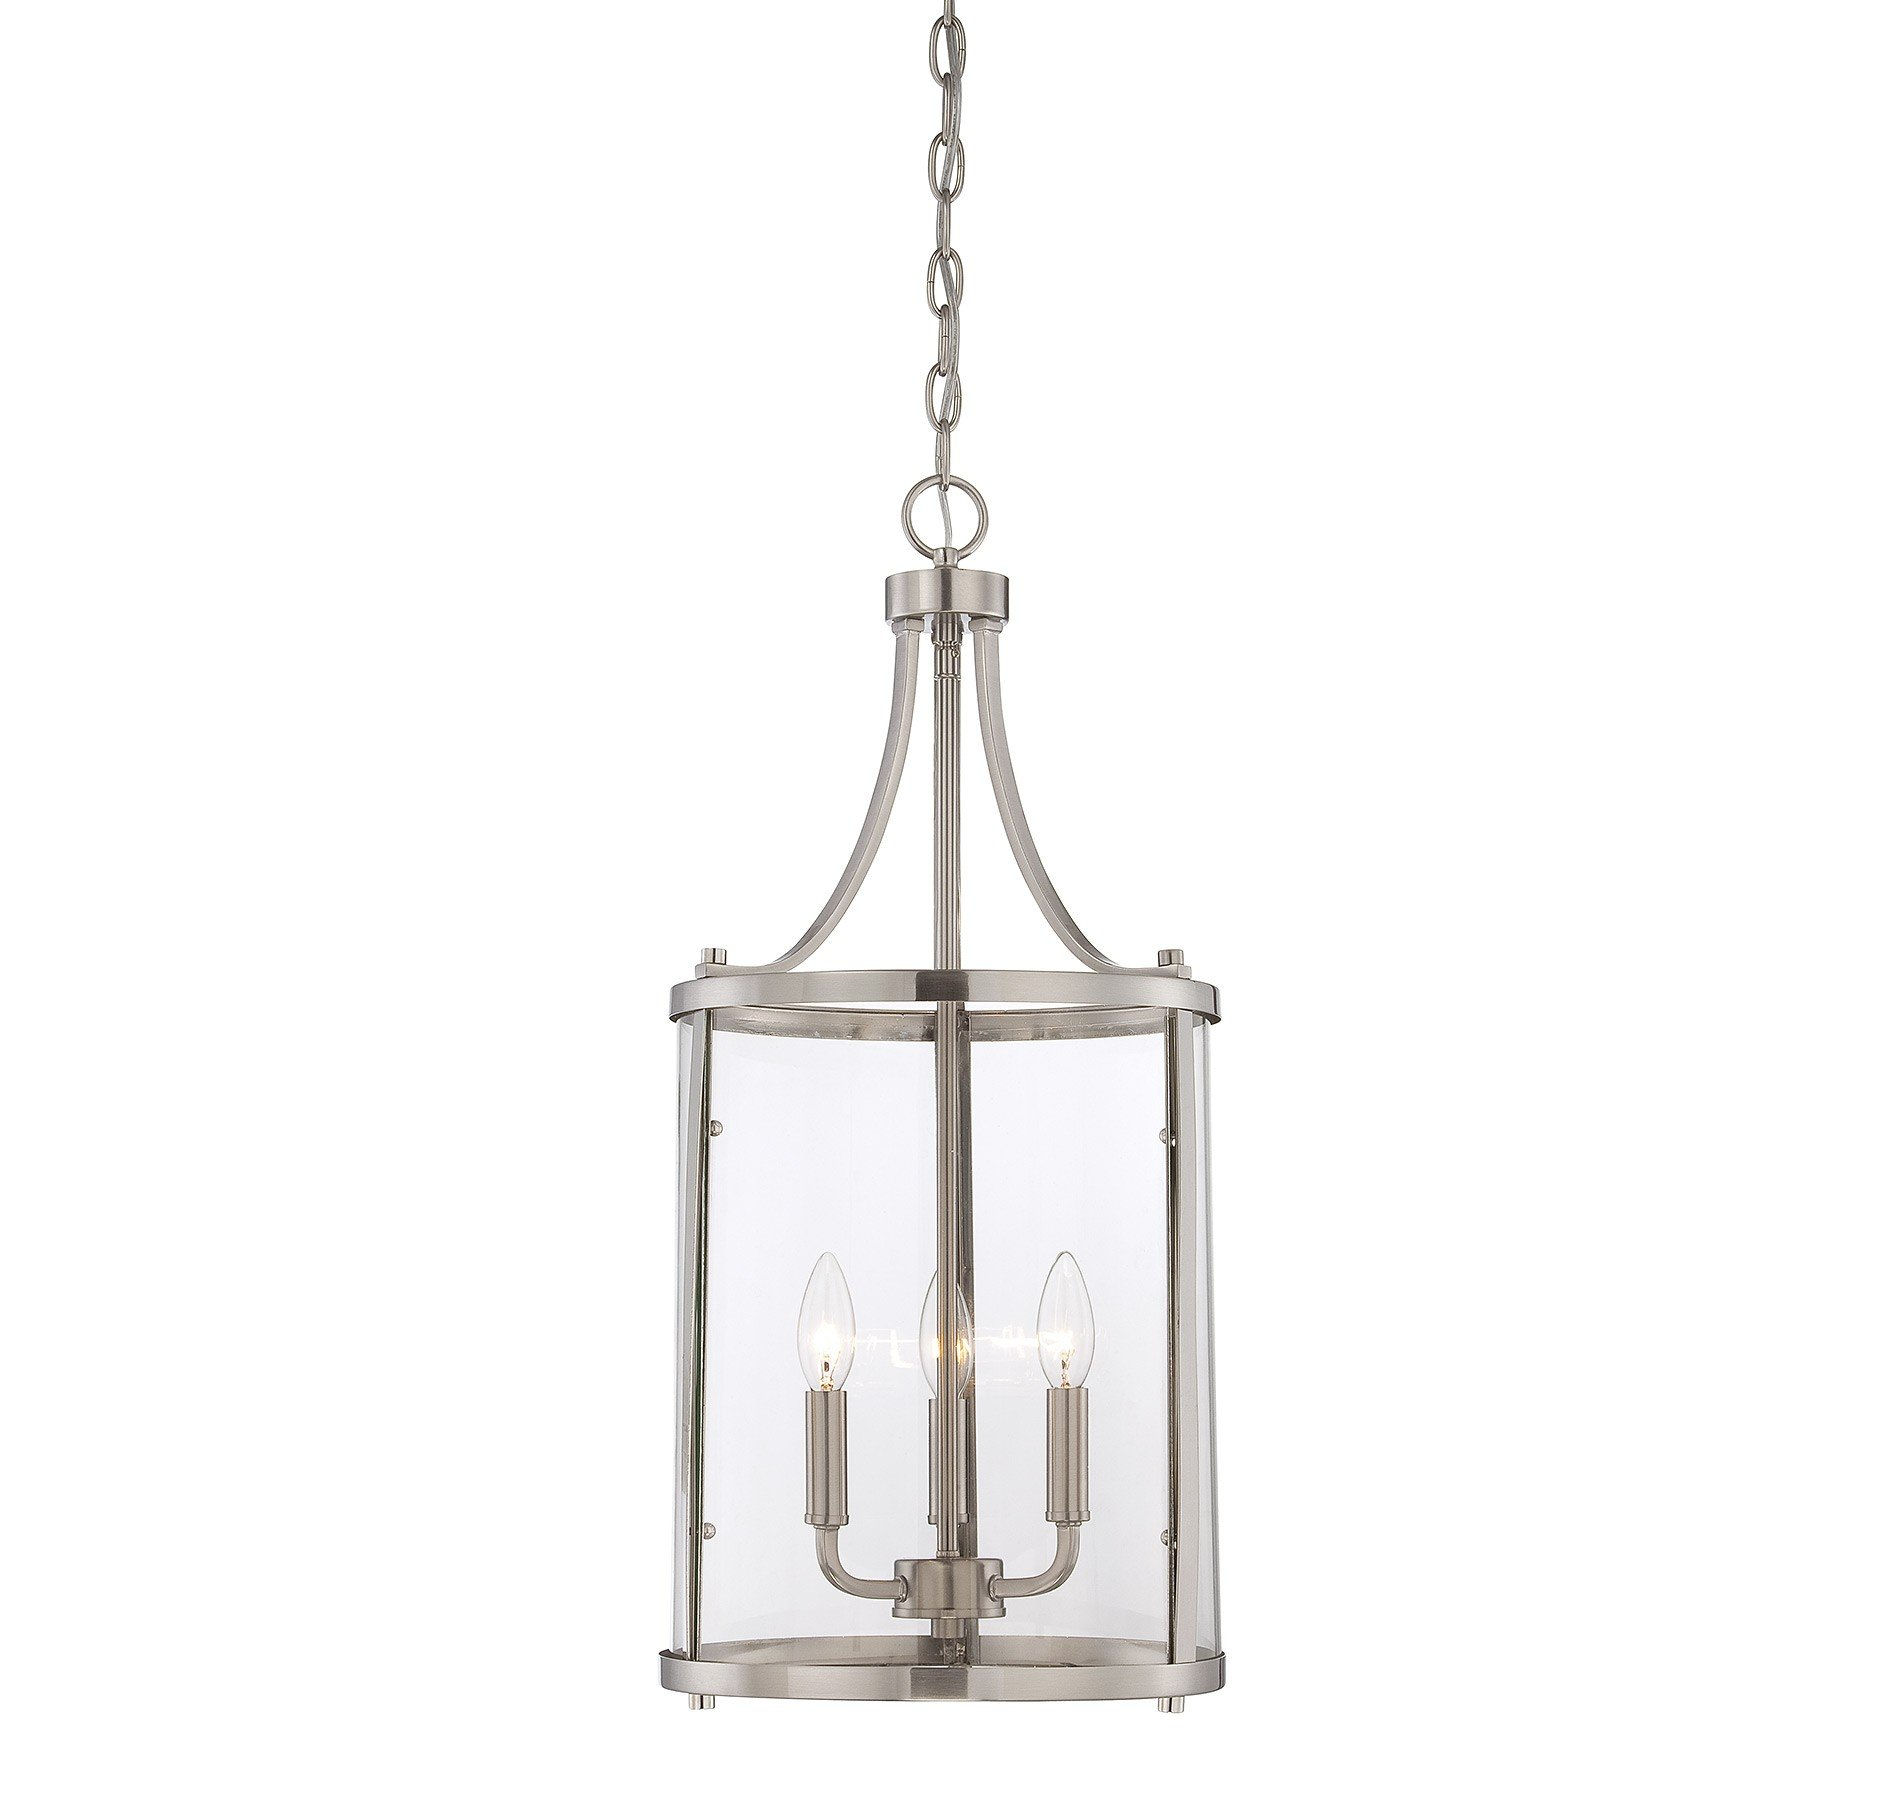 3 Light Lantern Cylinder Pendant Regarding Gabriella 3 Light Lantern Chandeliers (View 14 of 30)